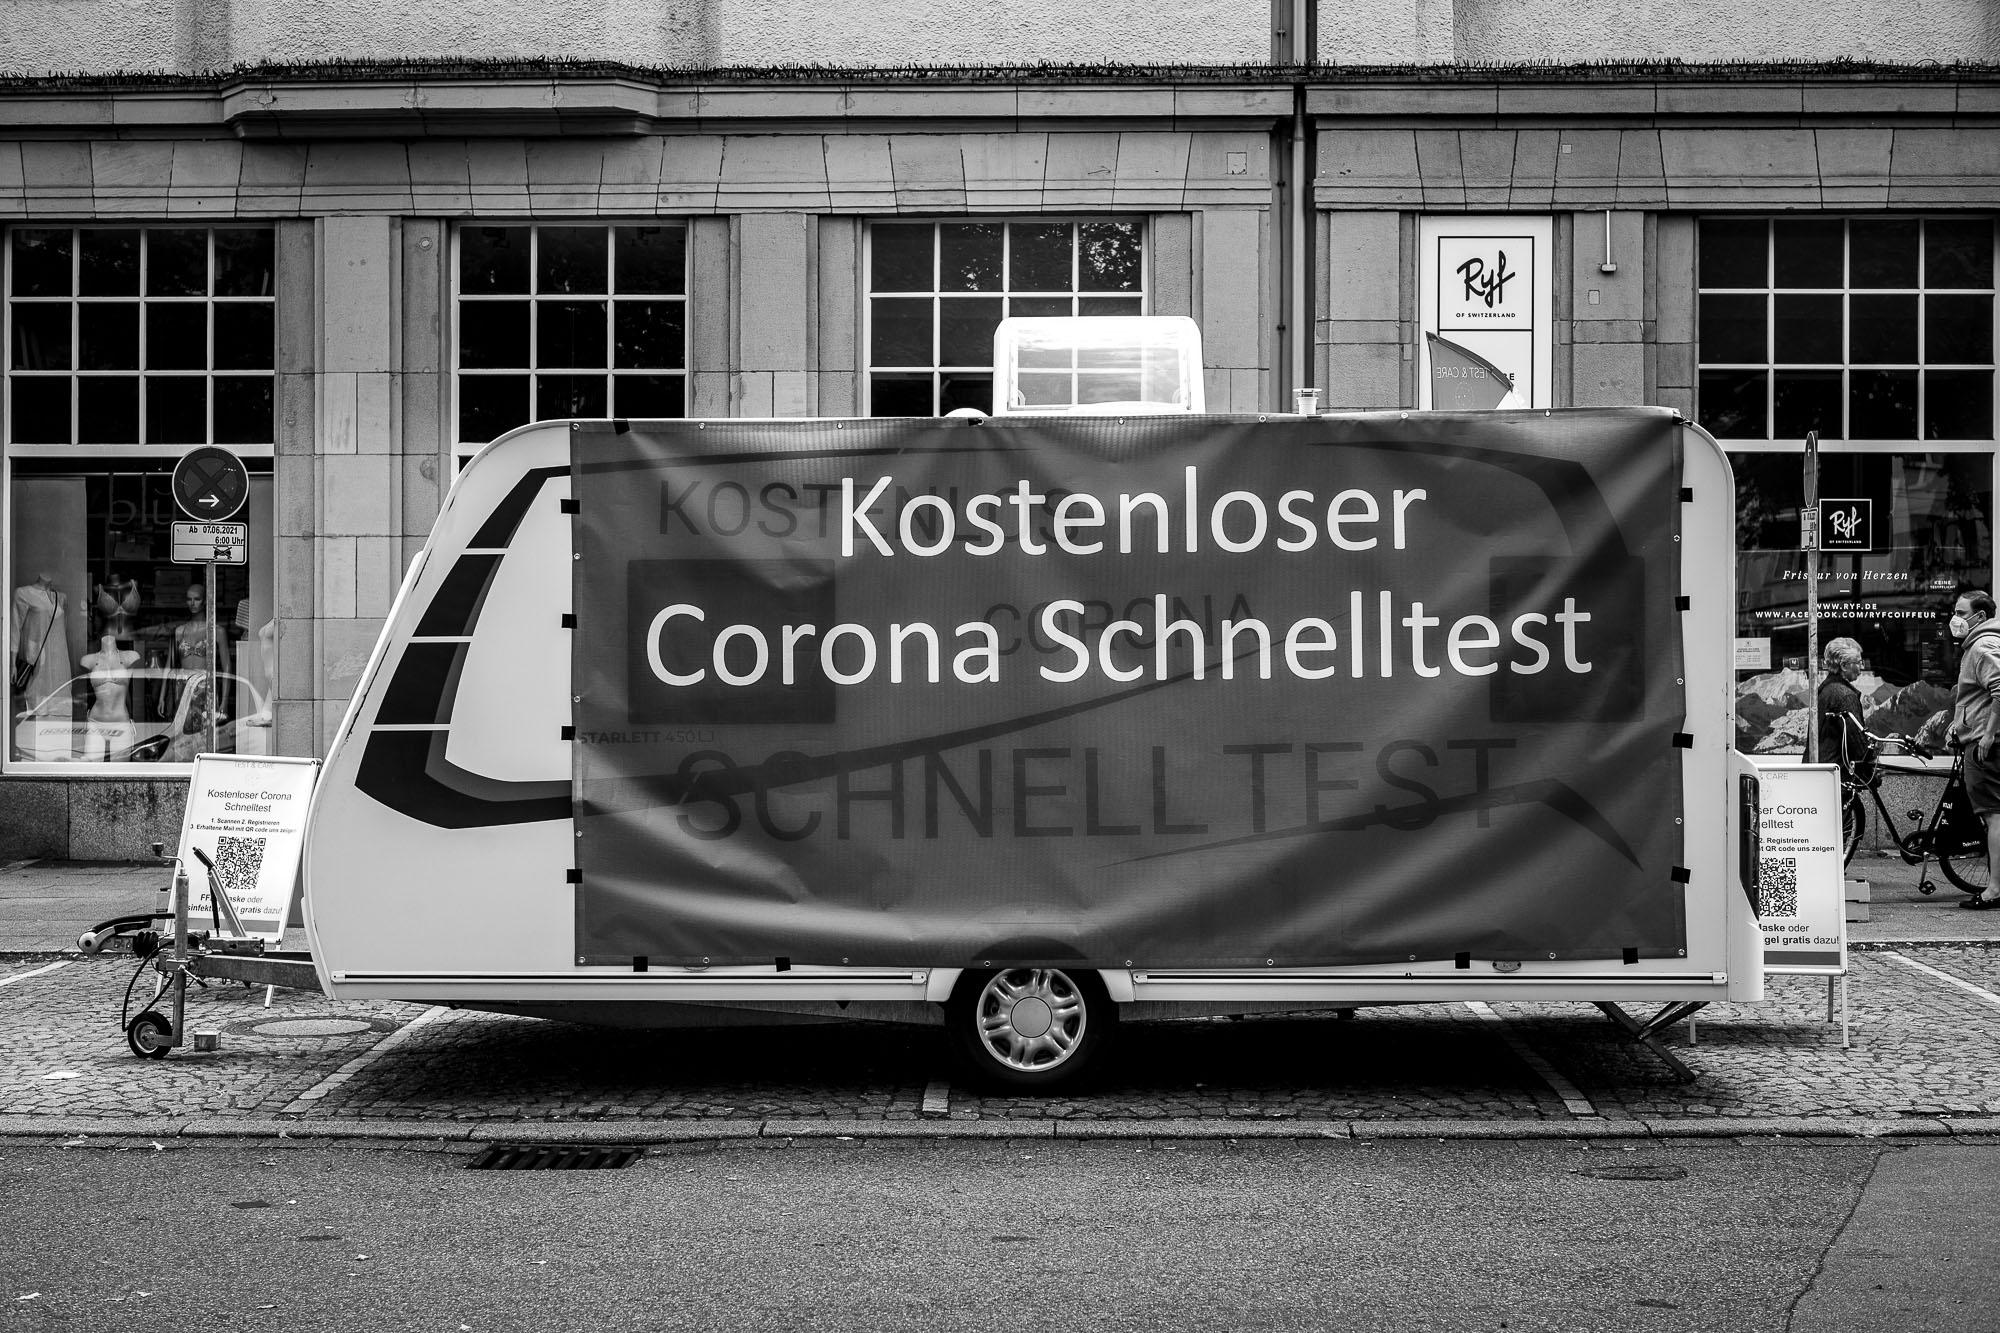 Corona test center inside a caravan